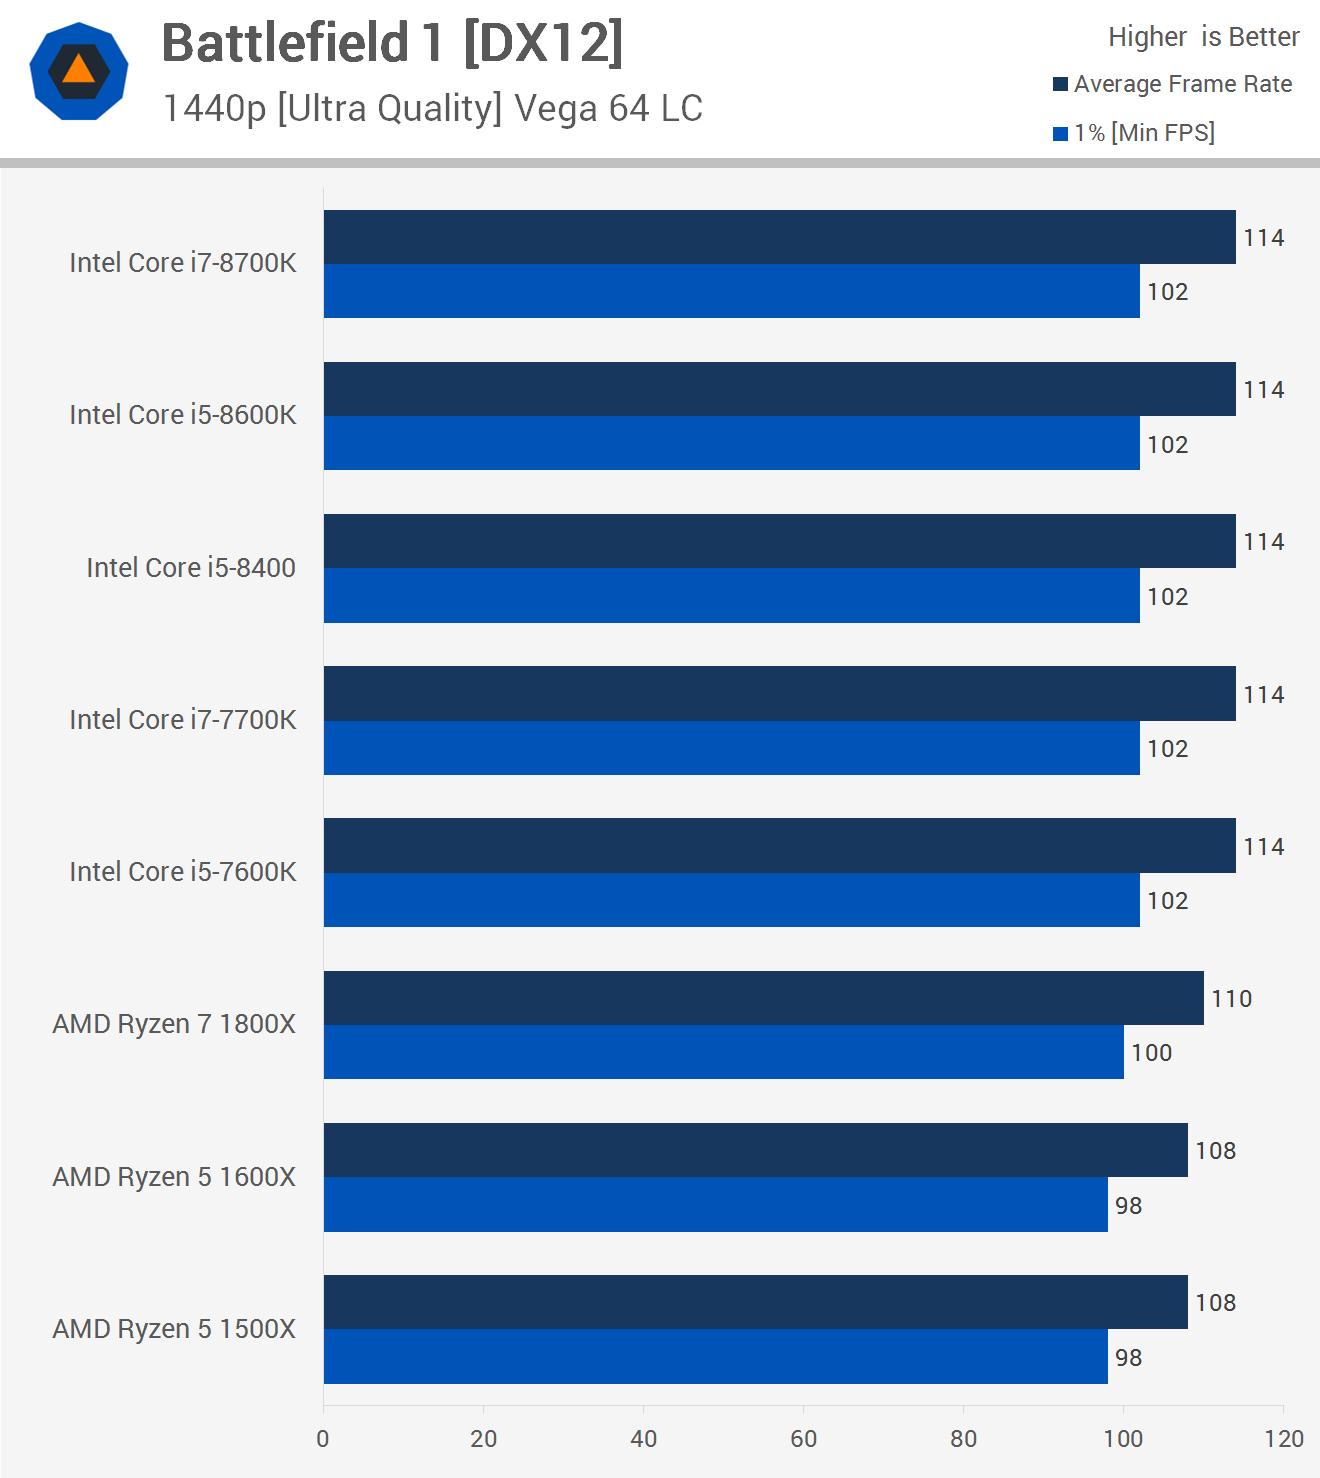 Intel Core i7-8700K ، i5-8600K ، 8400 مقابل AMD Ryzen 7 1800X ، R5 1600X ، 1500X 4